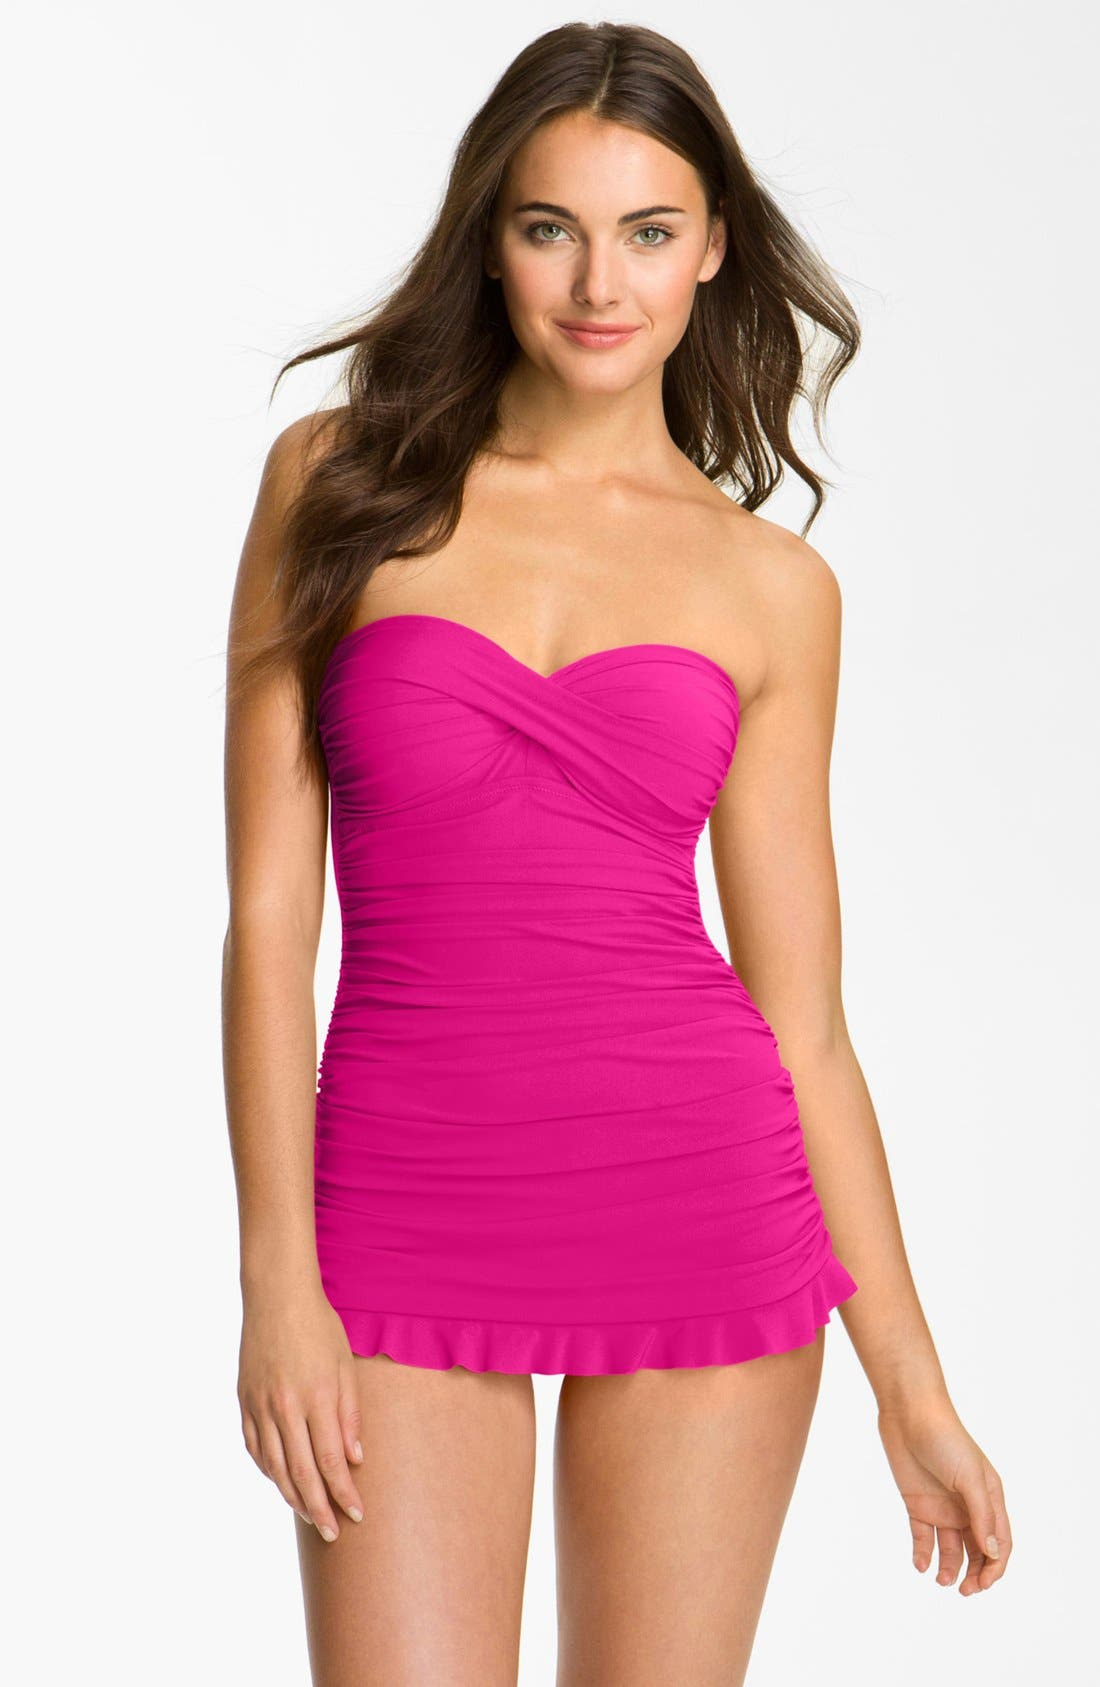 Main Image - Profile by Gottex 'Tutti Frutti' Skirted One-Piece Swim Dress